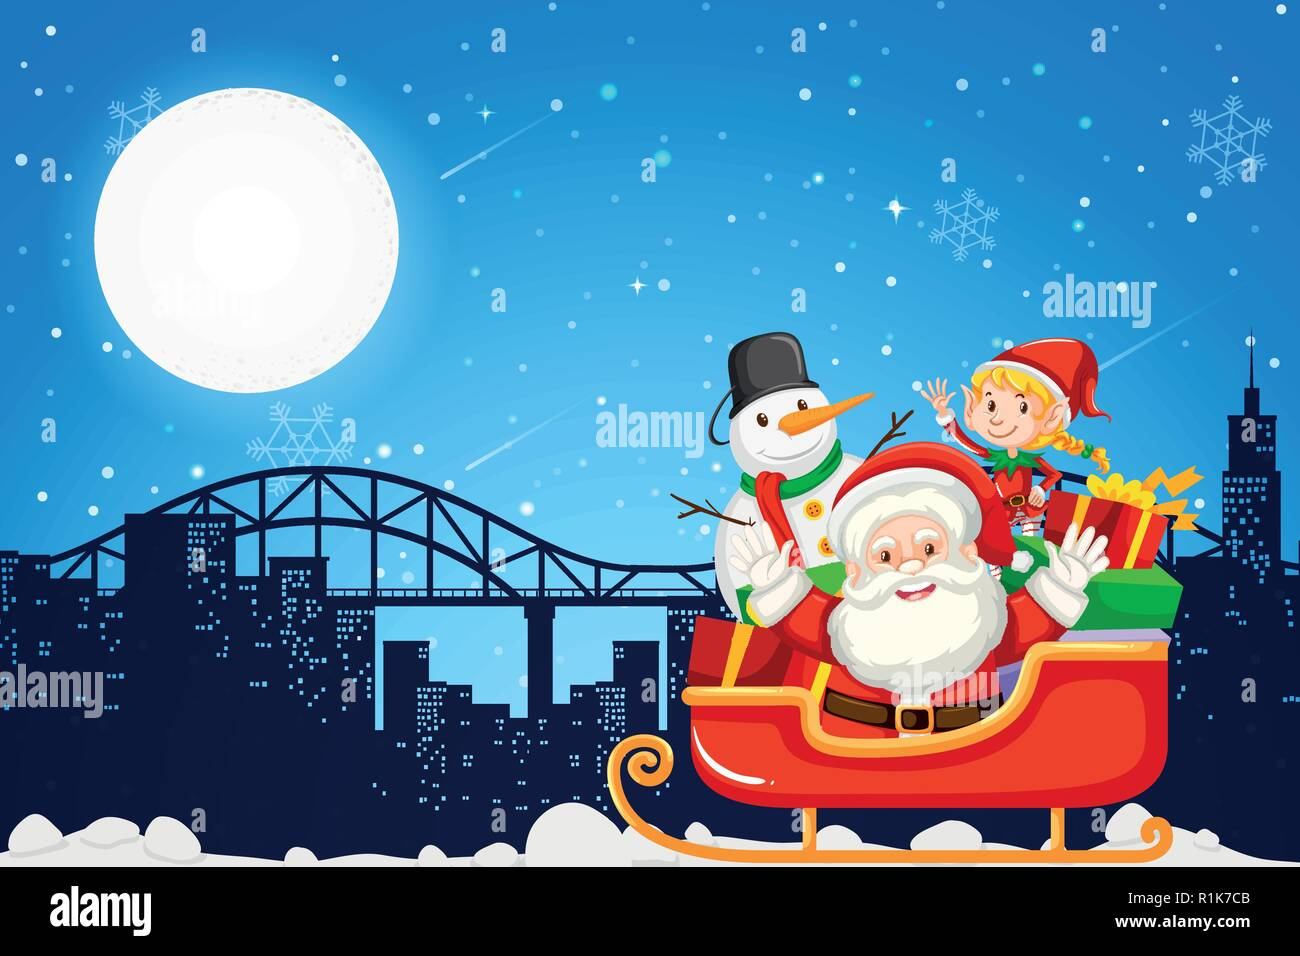 Christmas Town Clip Art Stockfotos & Christmas Town Clip Art Bilder ...